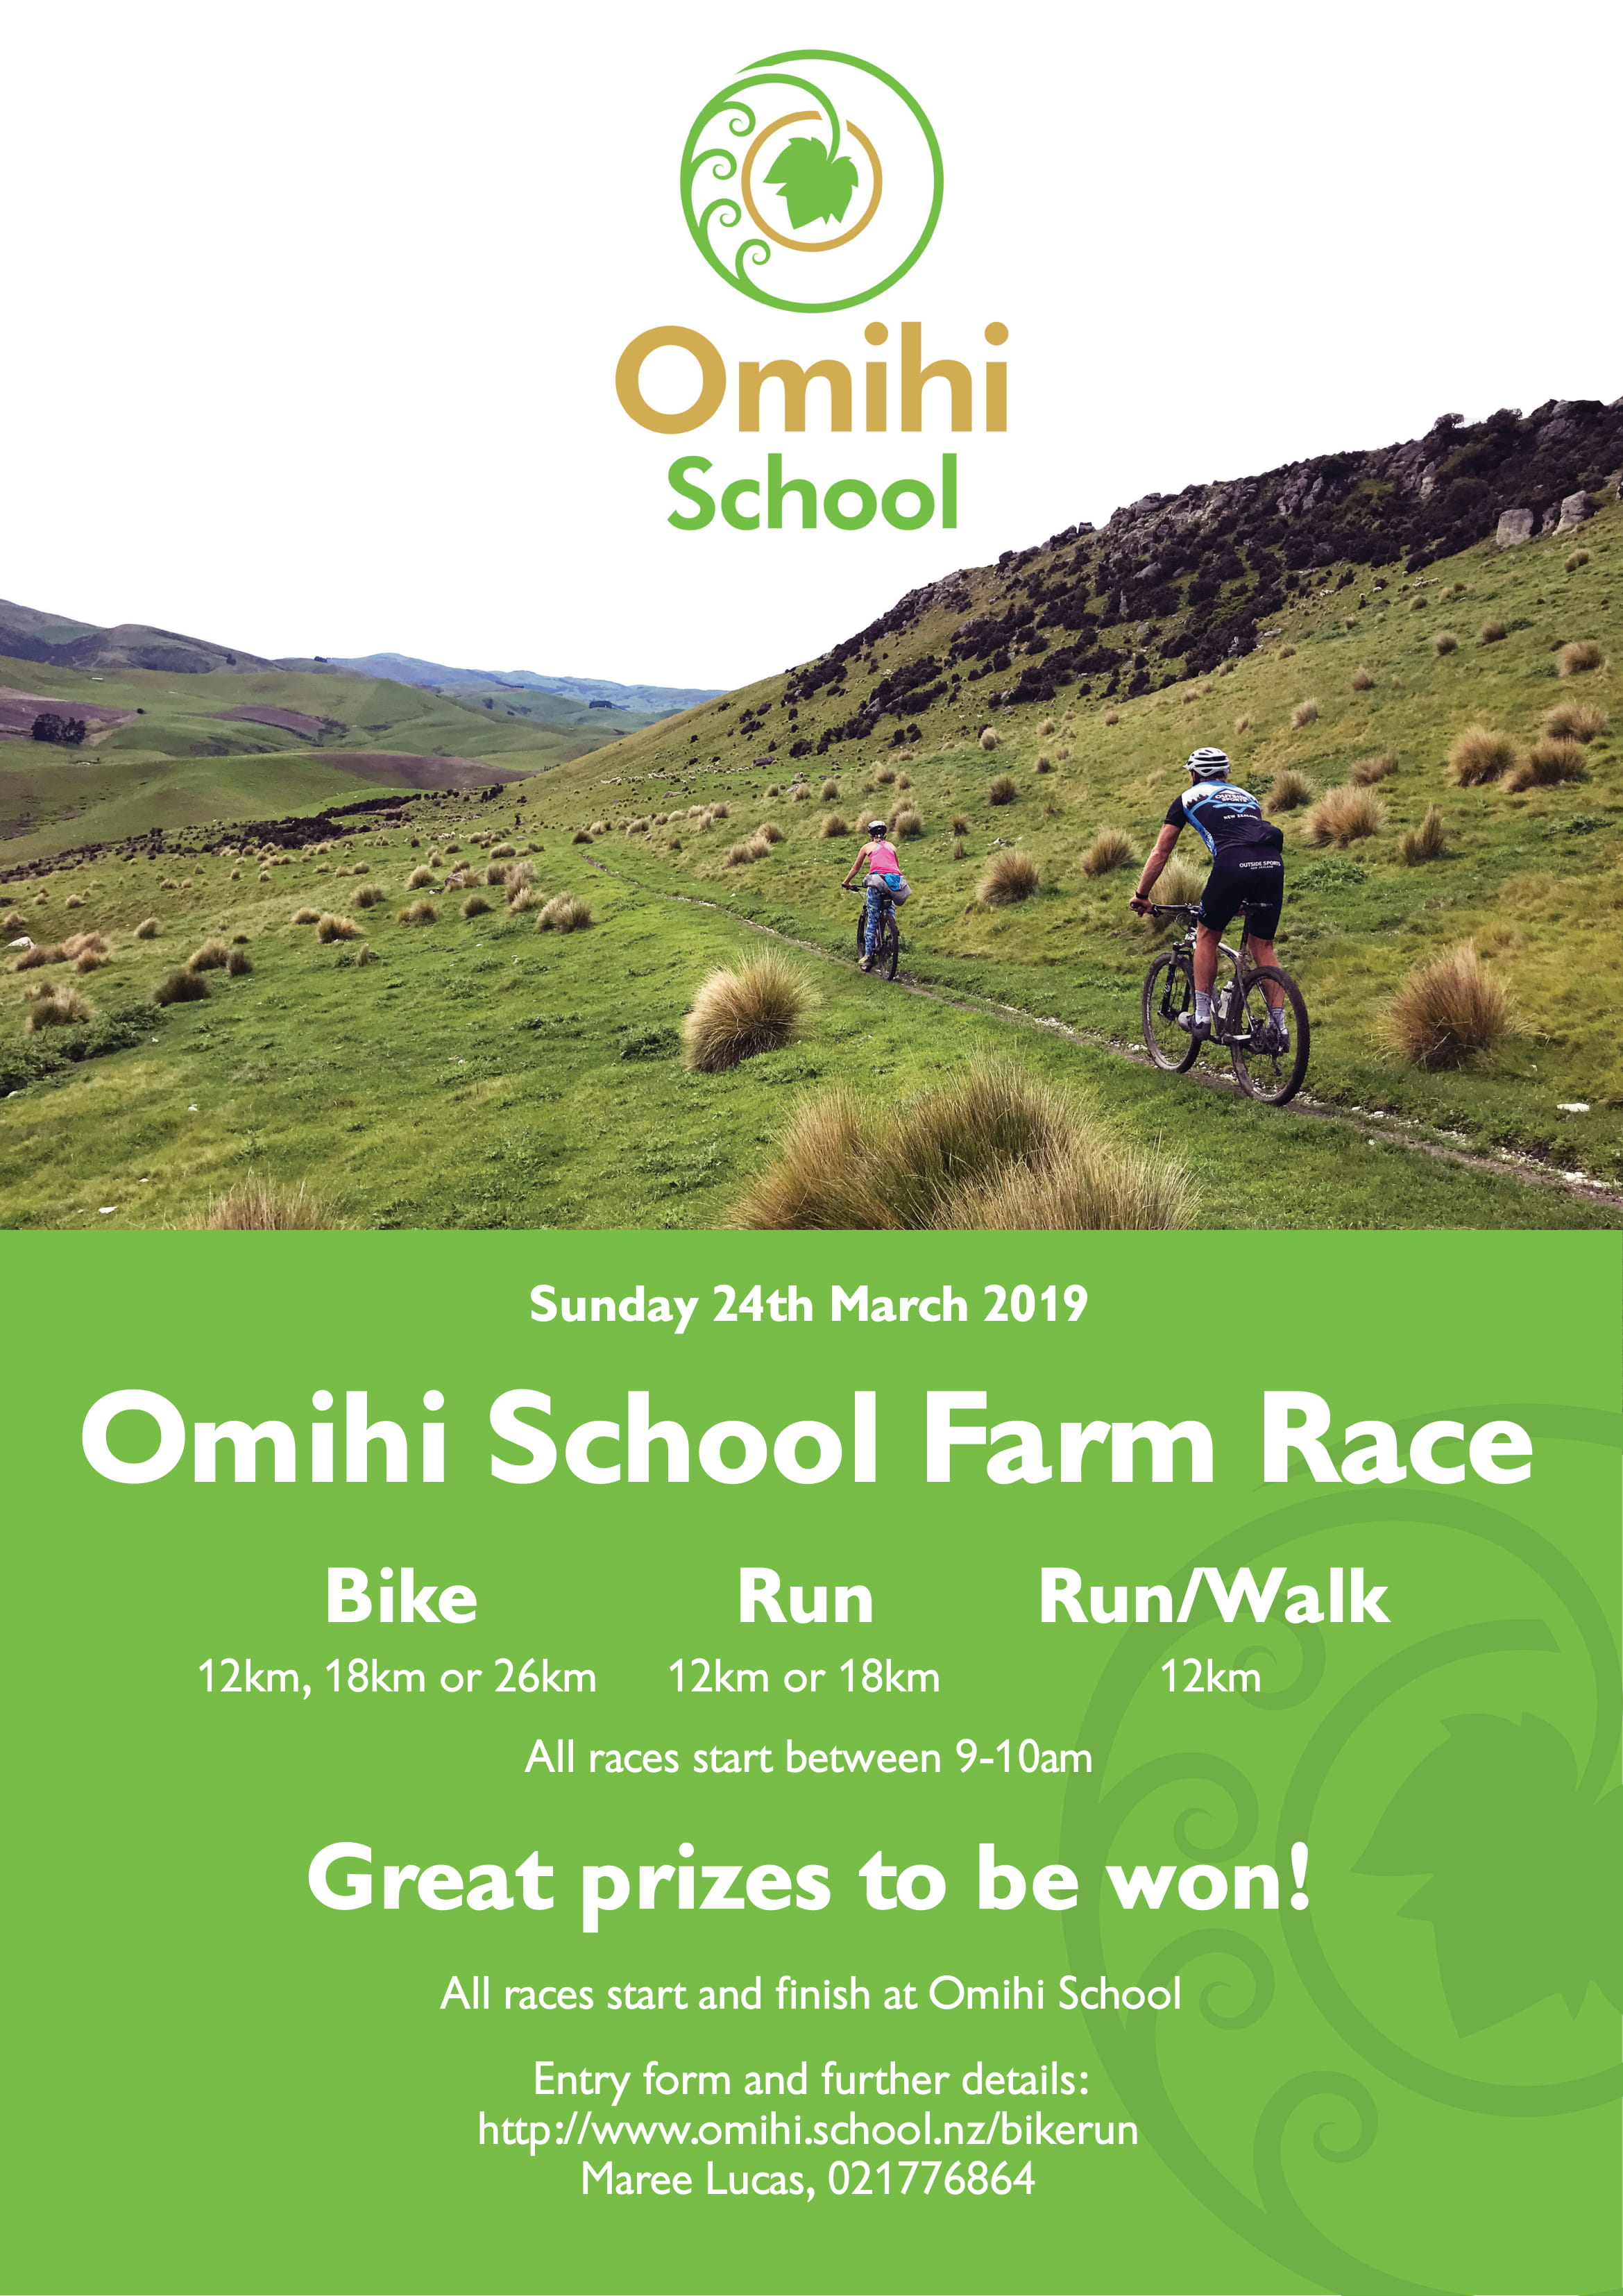 Omihi School Fun Run Bike Walk Poster WEB-1.jpg